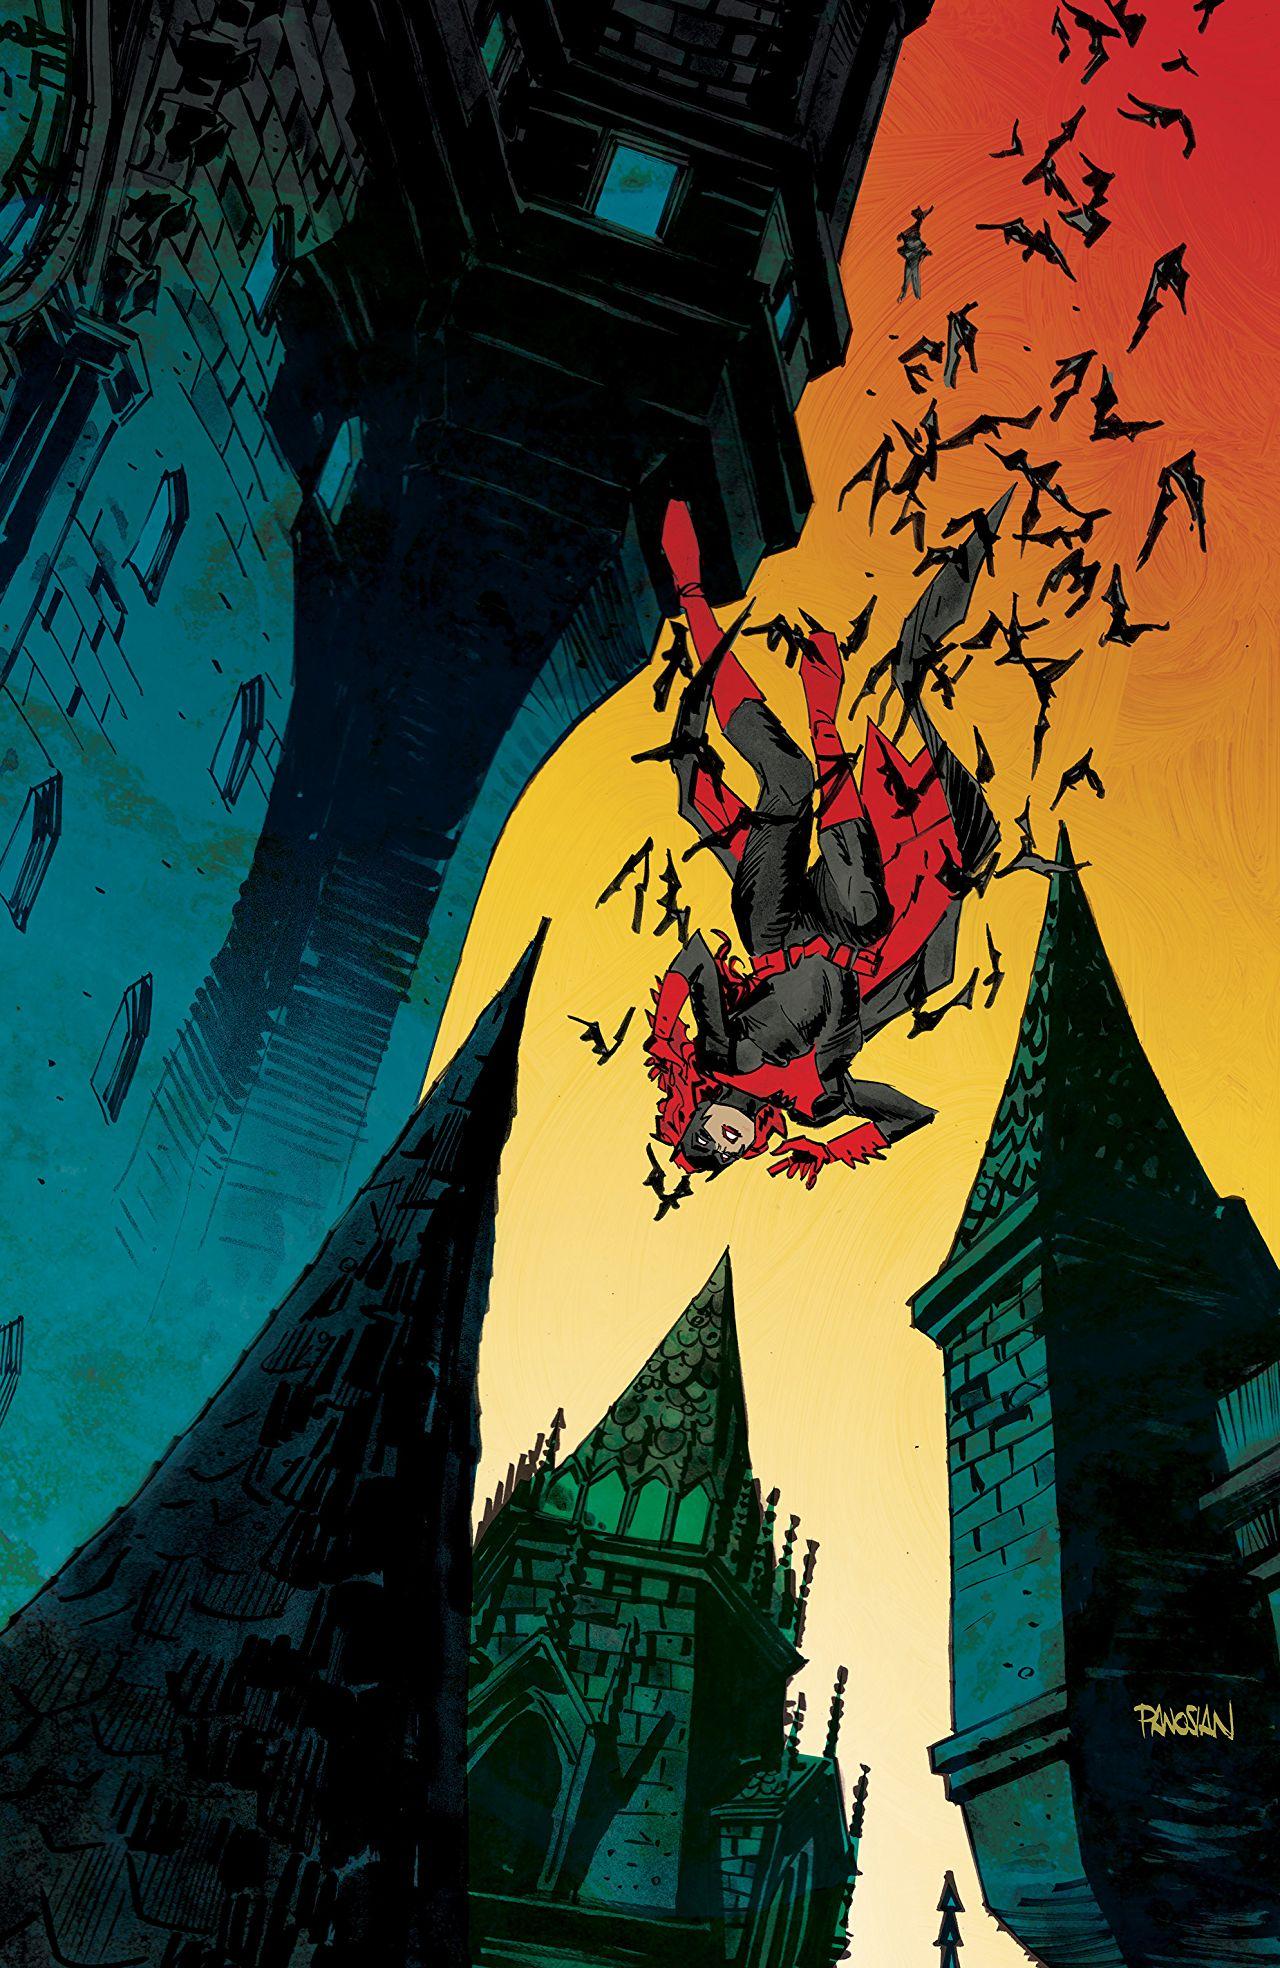 Batwoman Vol 3 12 Textless.jpg